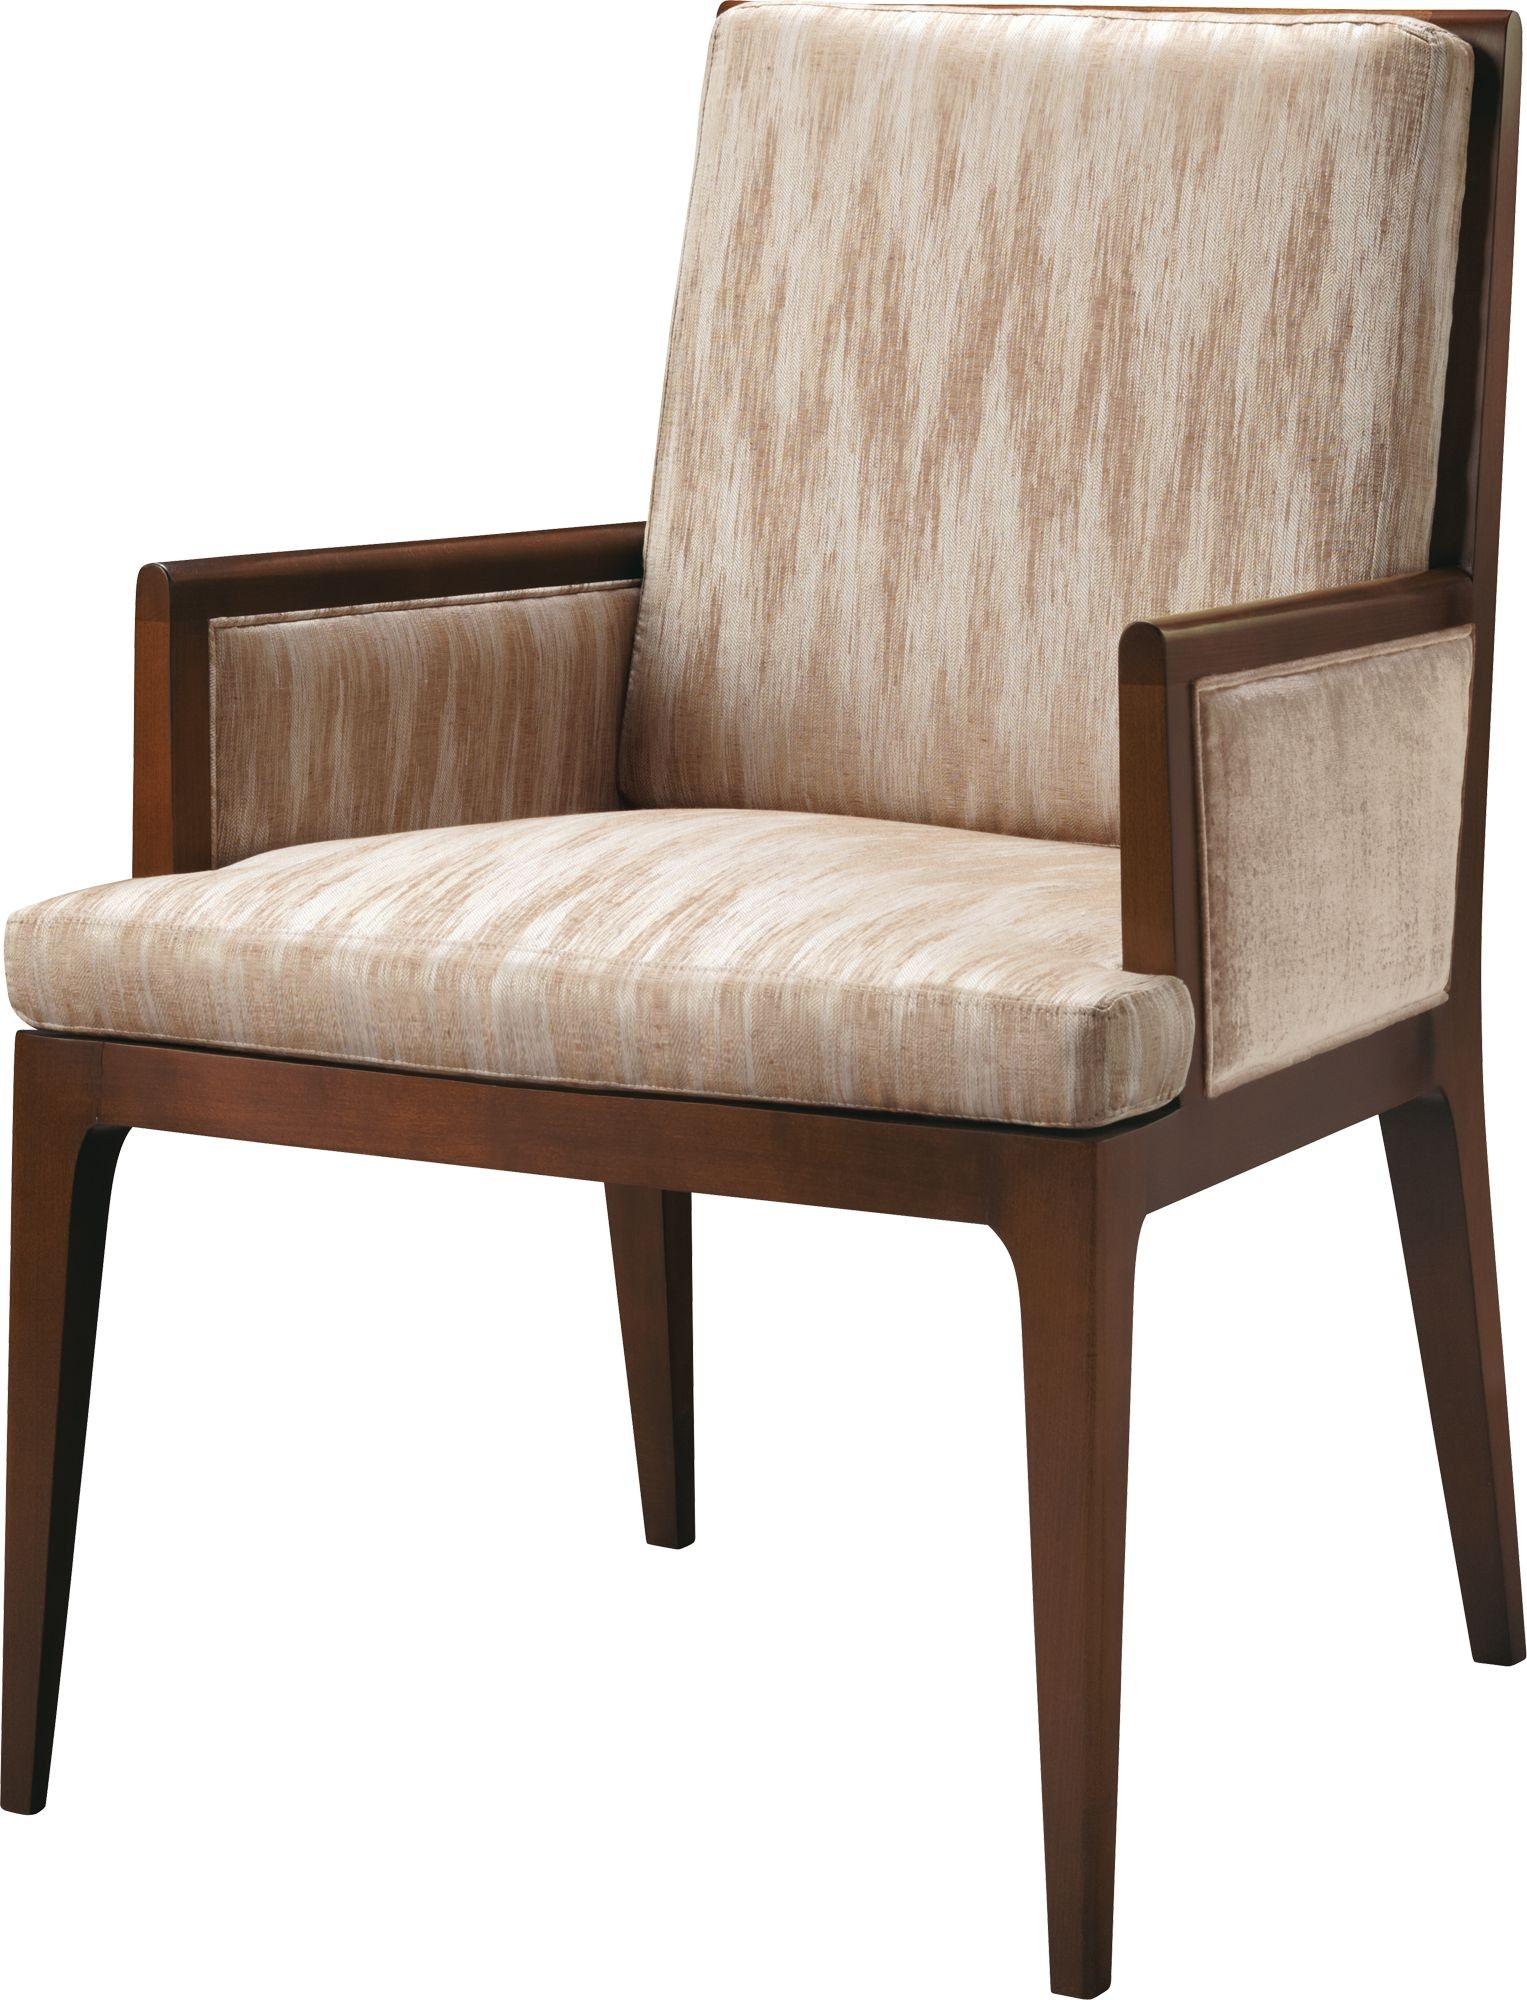 Baker Furniture Barbara Barry Carmel Upholstered Dining Arm Chair 3643 1